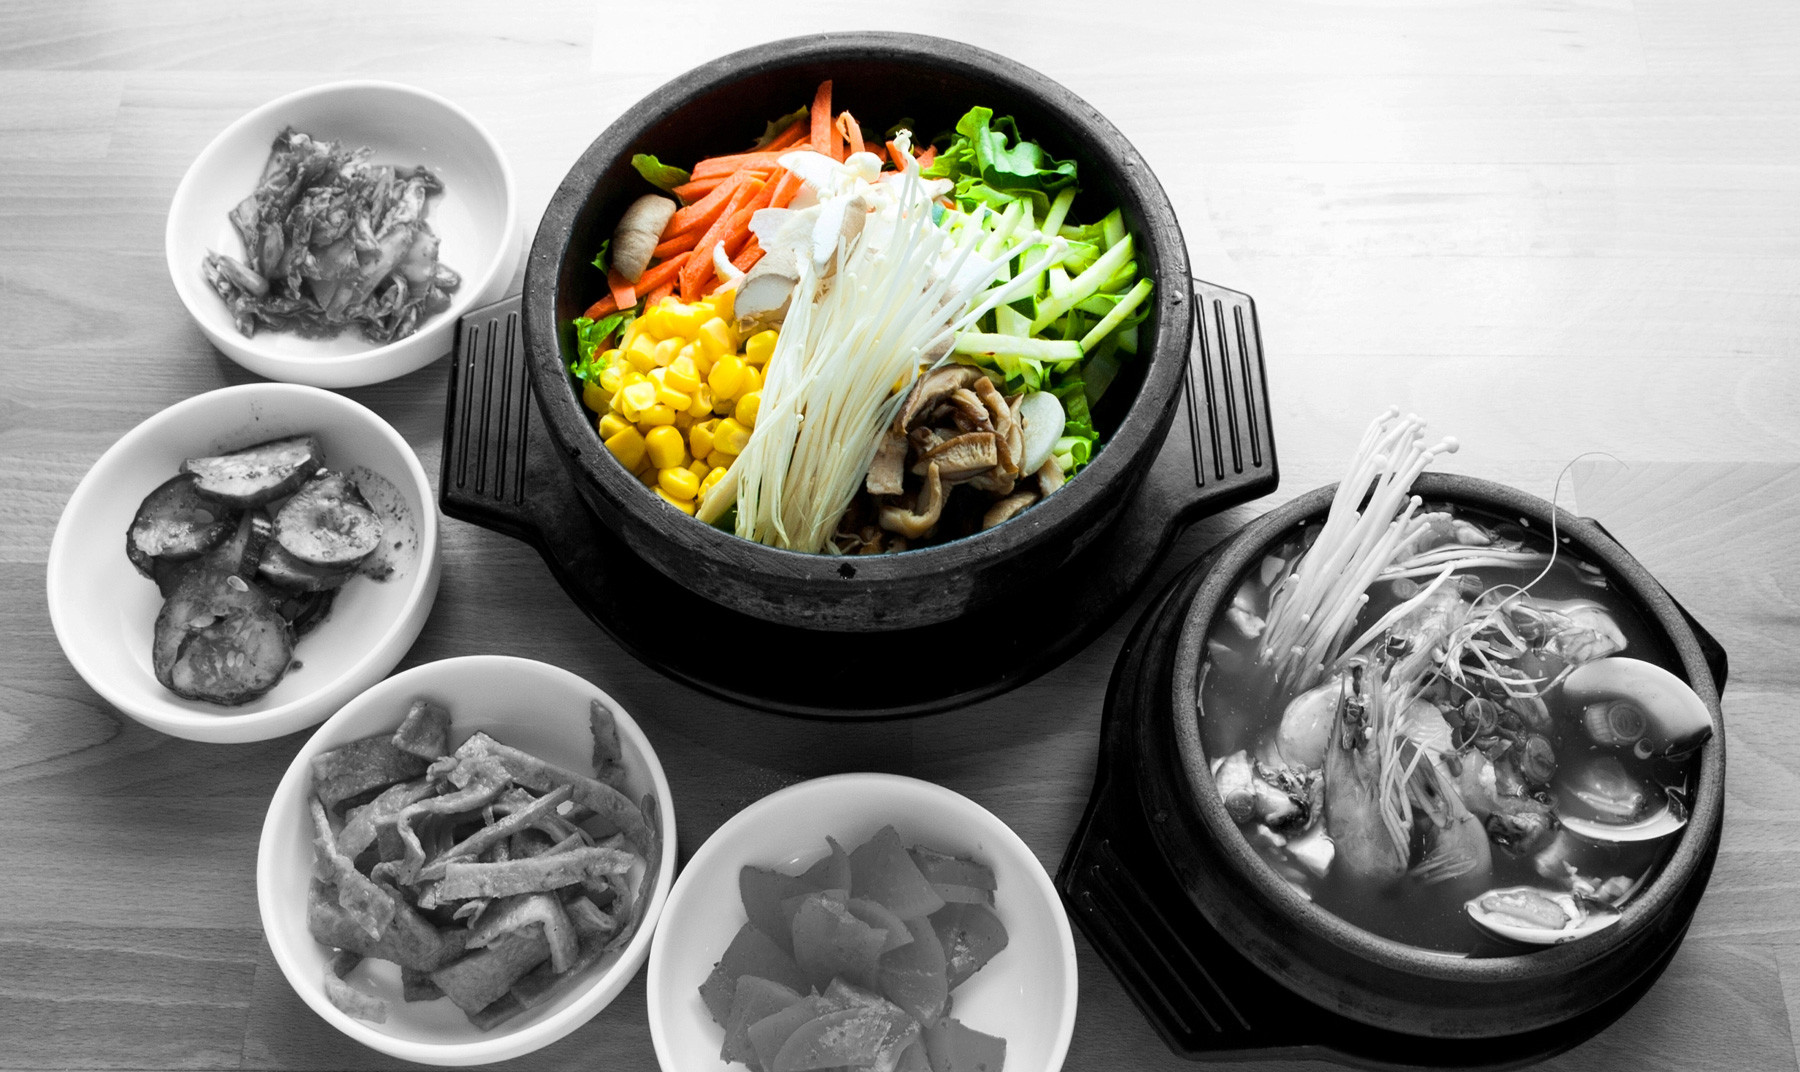 Vege hotstone & Seafood tofu